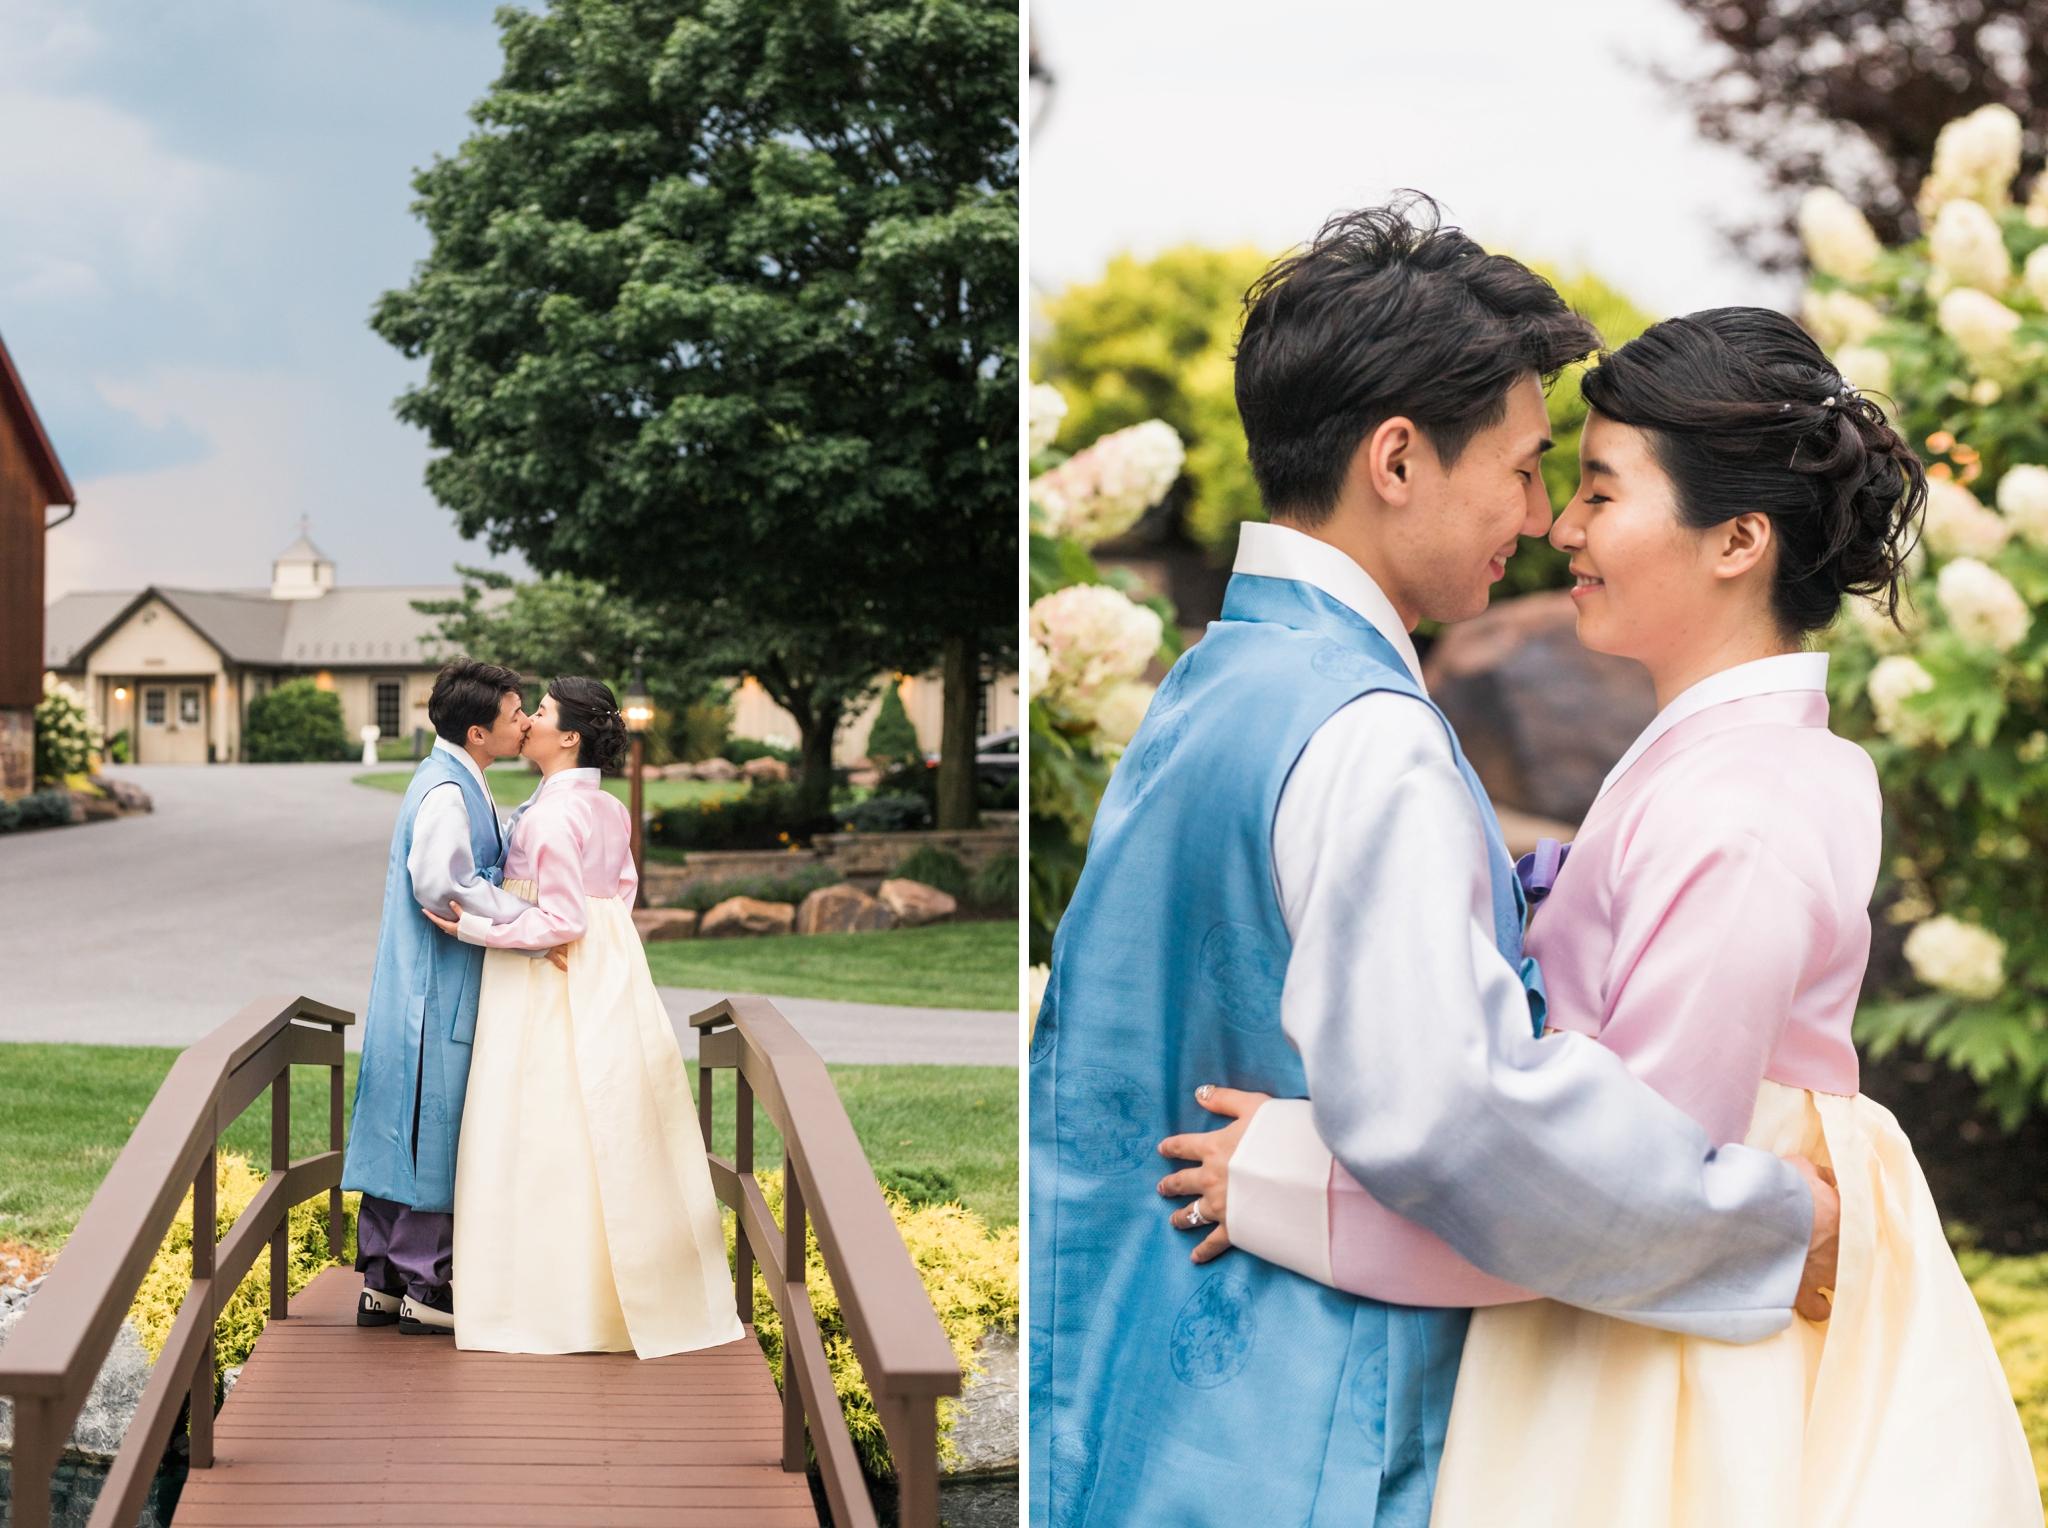 Emily Grace Photography, Elizabethtown PA Wedding Photographer, Harvest View Barn at Hershey Farms Wedding Venue, Elizabethtown PA Wedding Venue, Traditional Korean Wedding